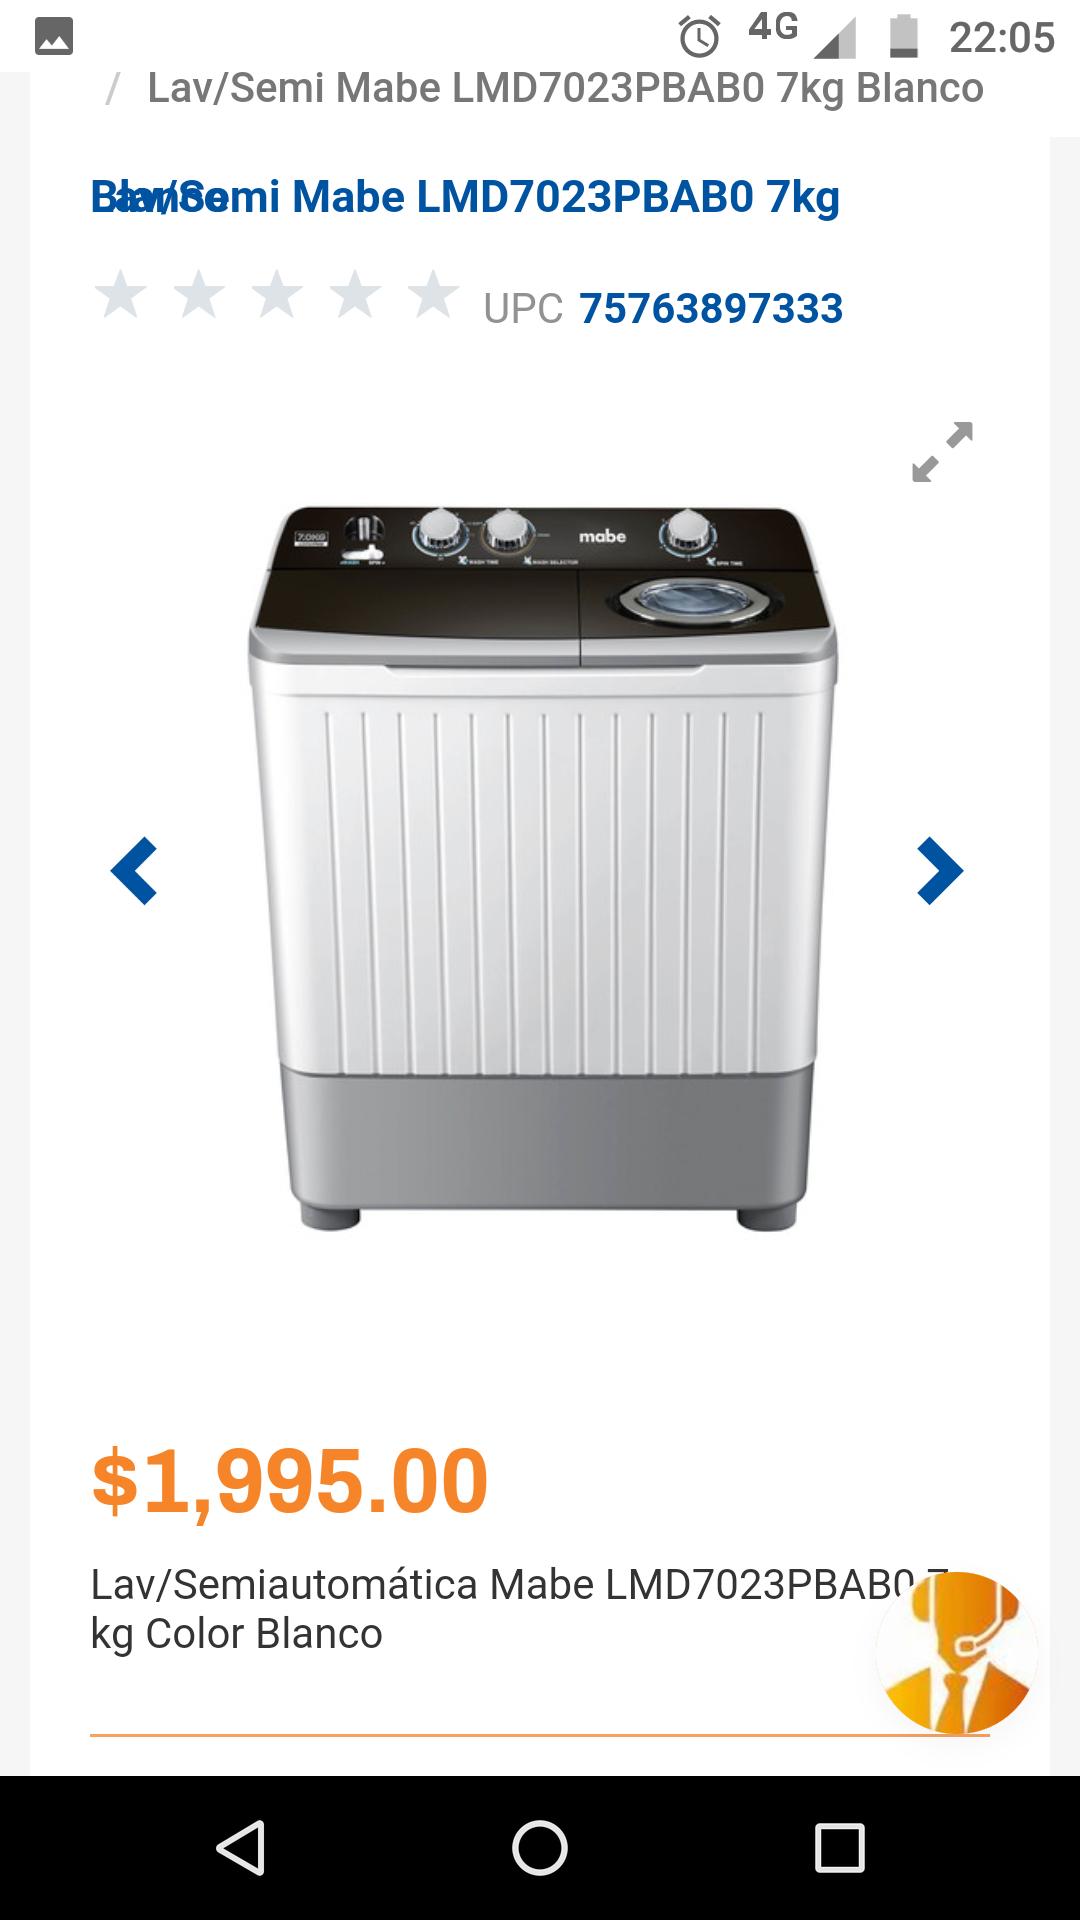 Chedraui en línea: Lavadora Semiautomática Mabe LMD7023PBAB0 7kg Blanca